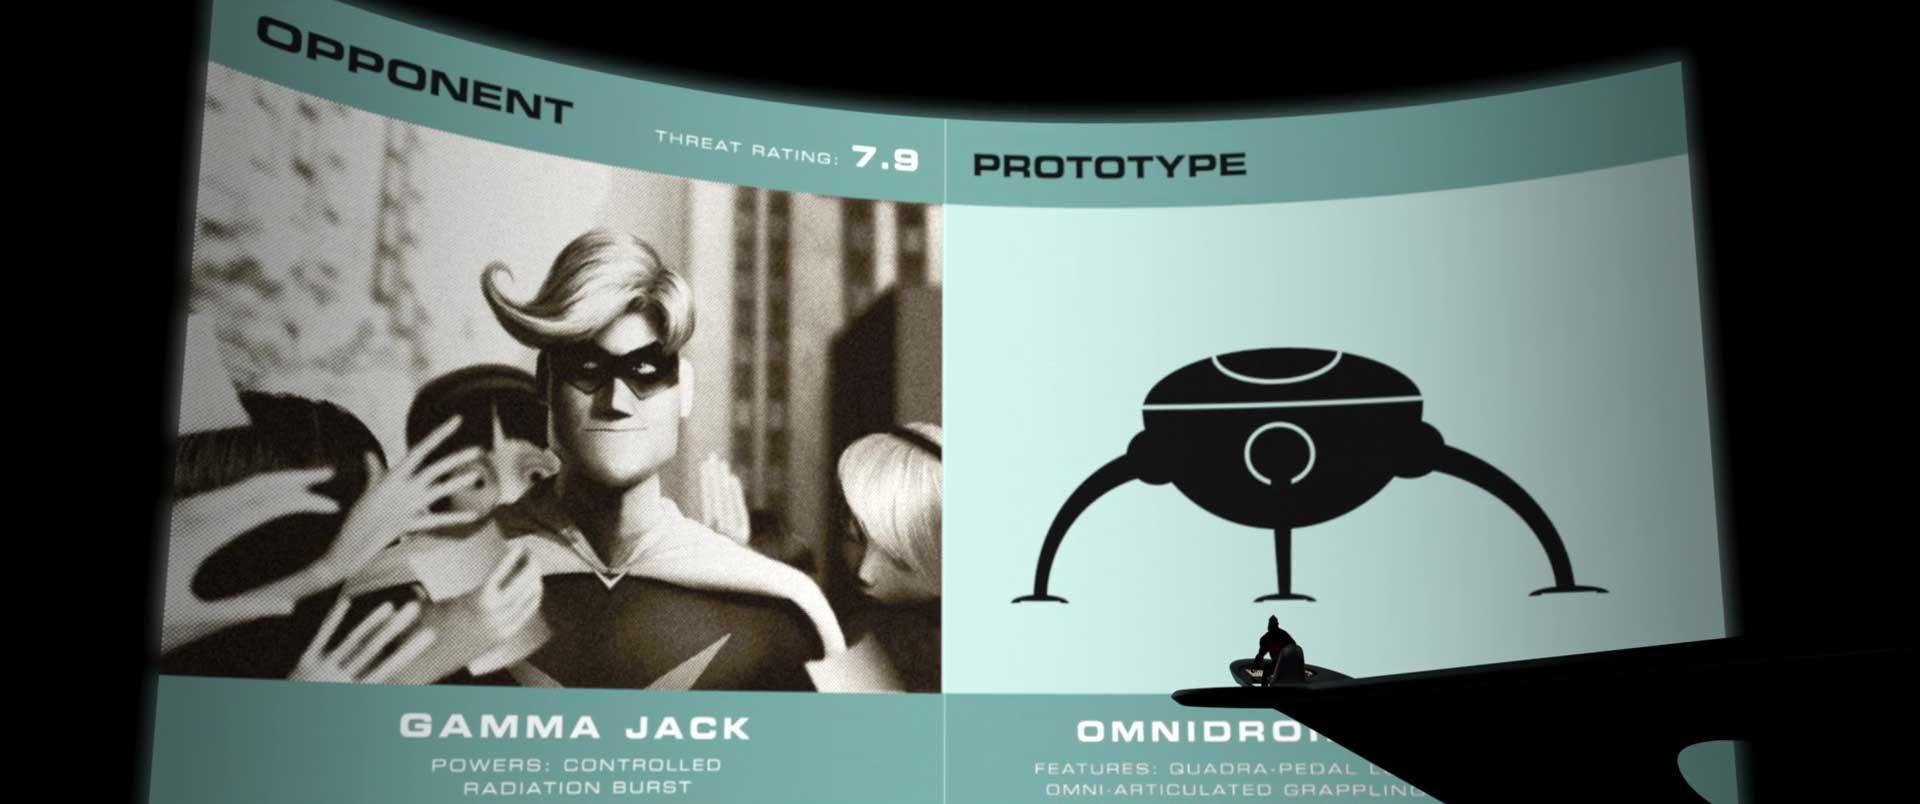 gamma jack pixar disney personnage character indestructibles incredibles